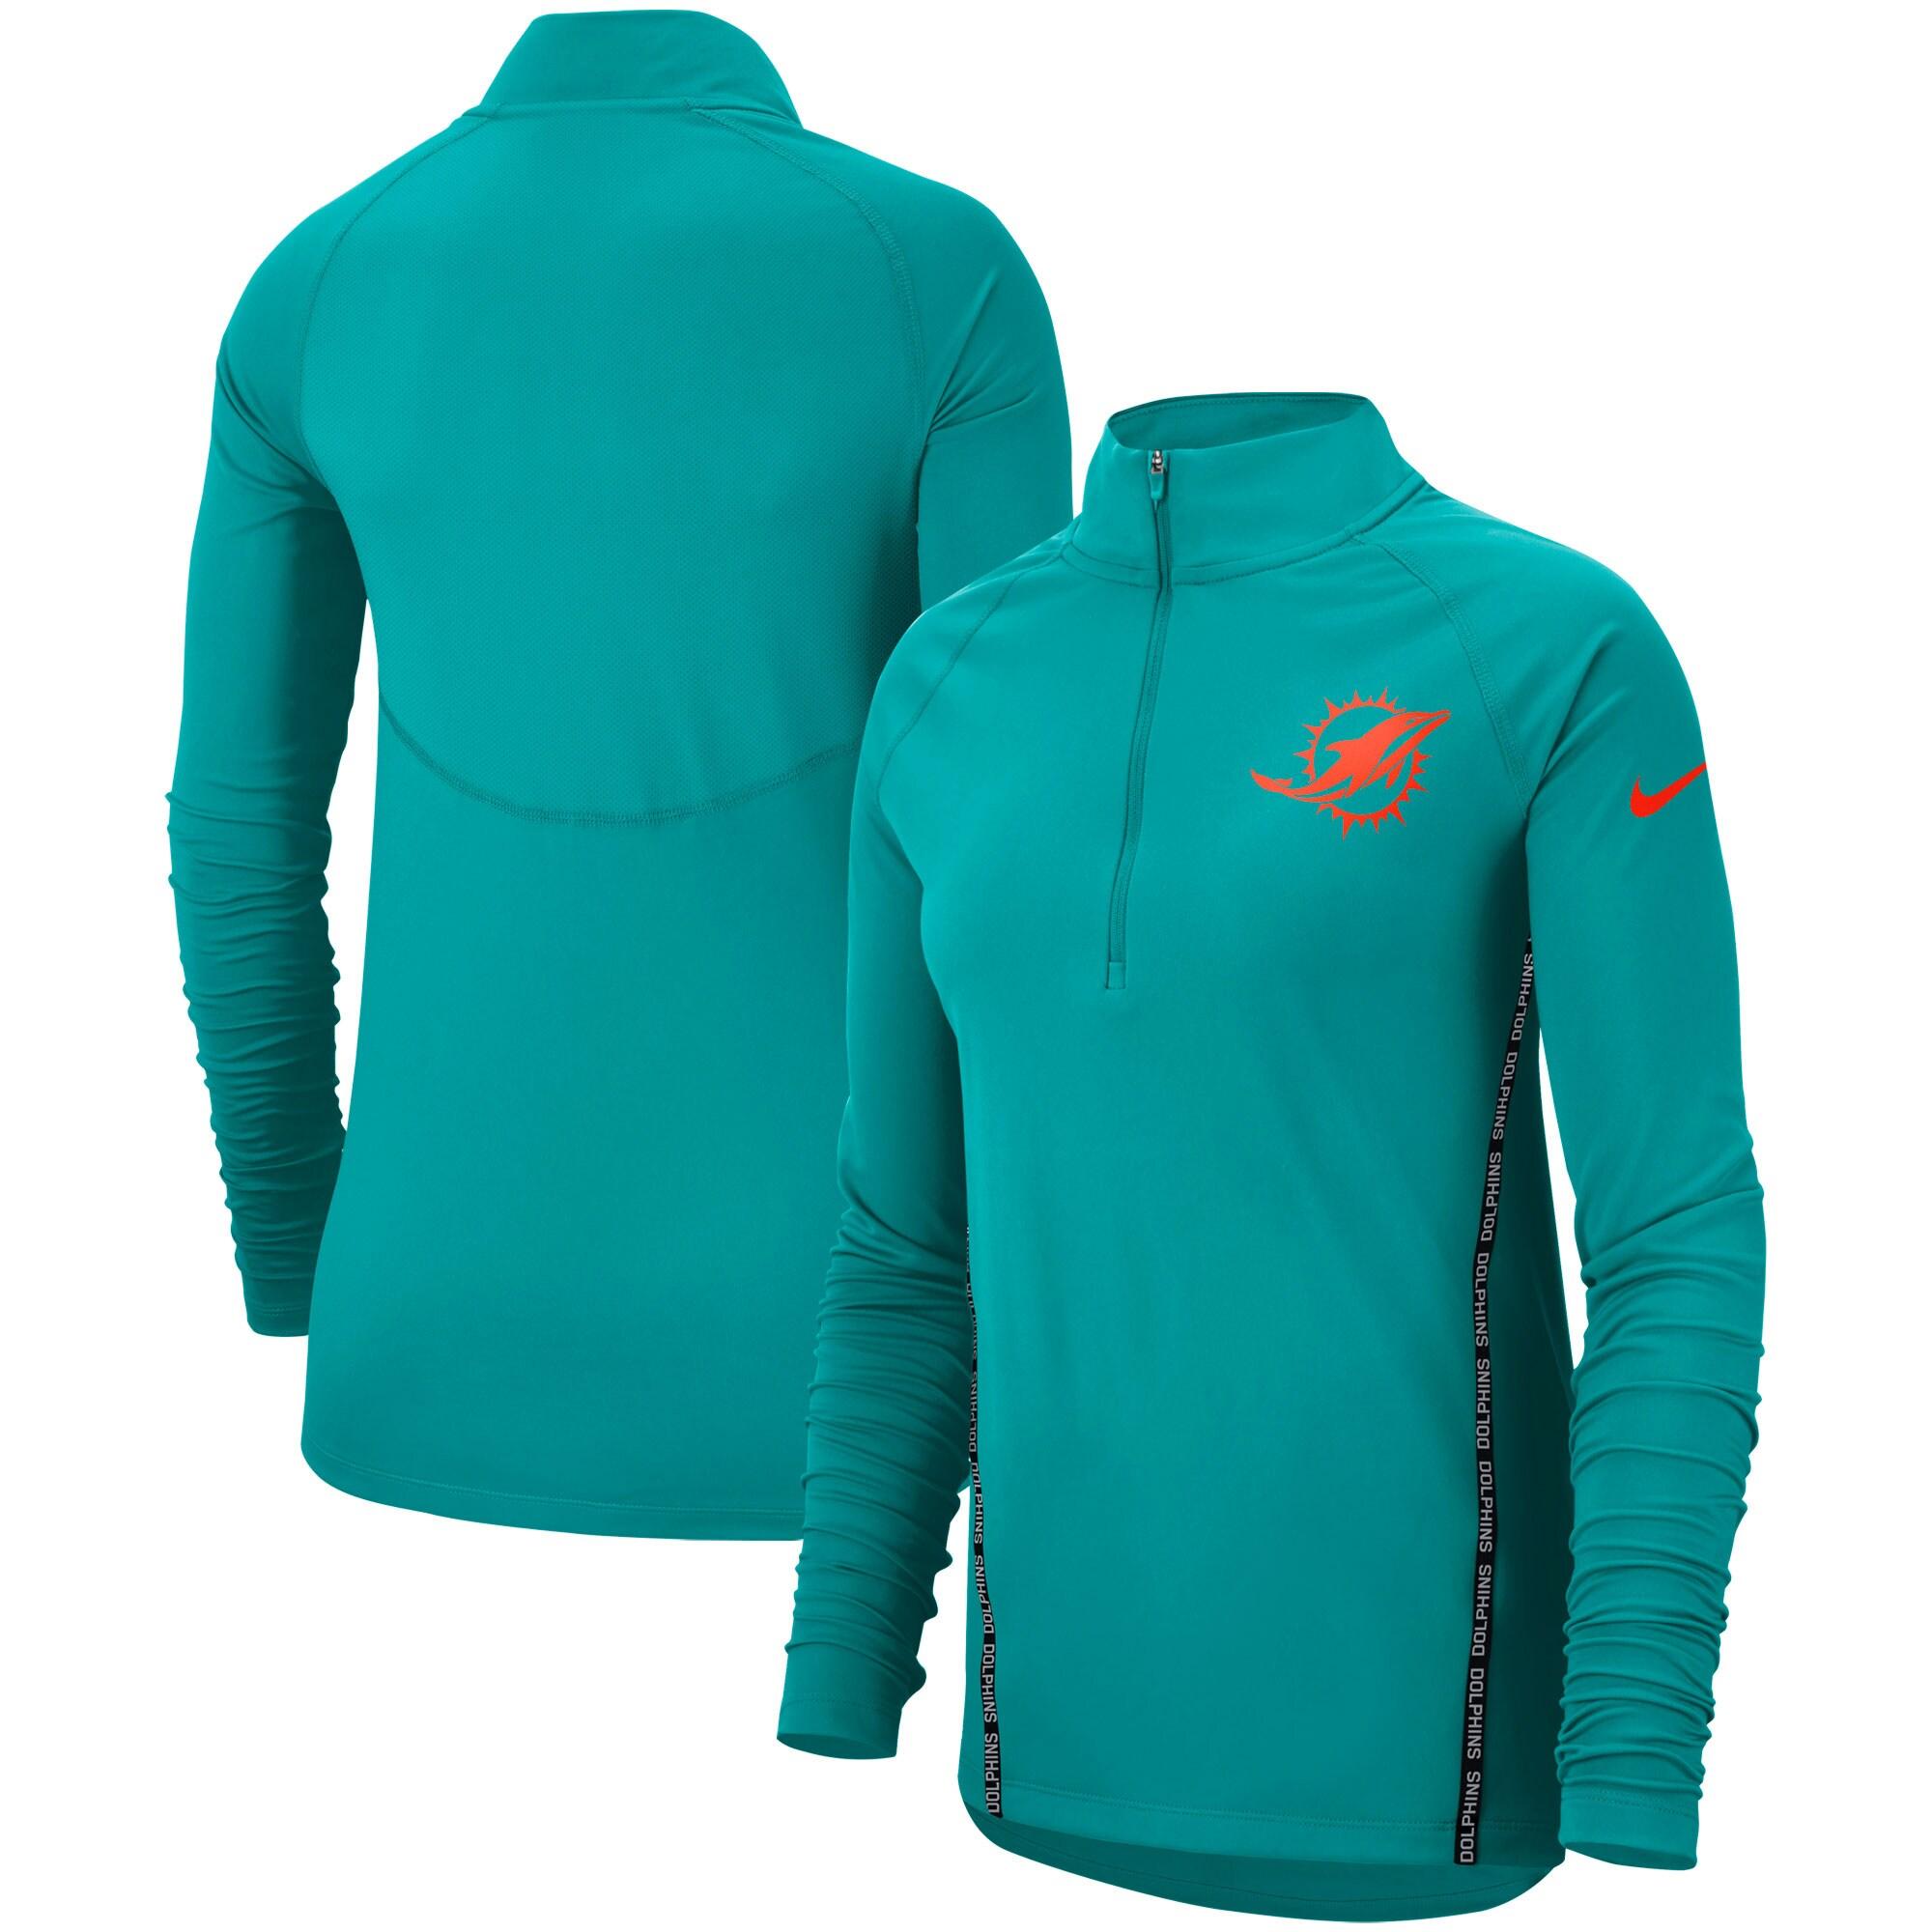 Miami Dolphins Nike Women's Core Half-Zip Pullover Jacket - Aqua